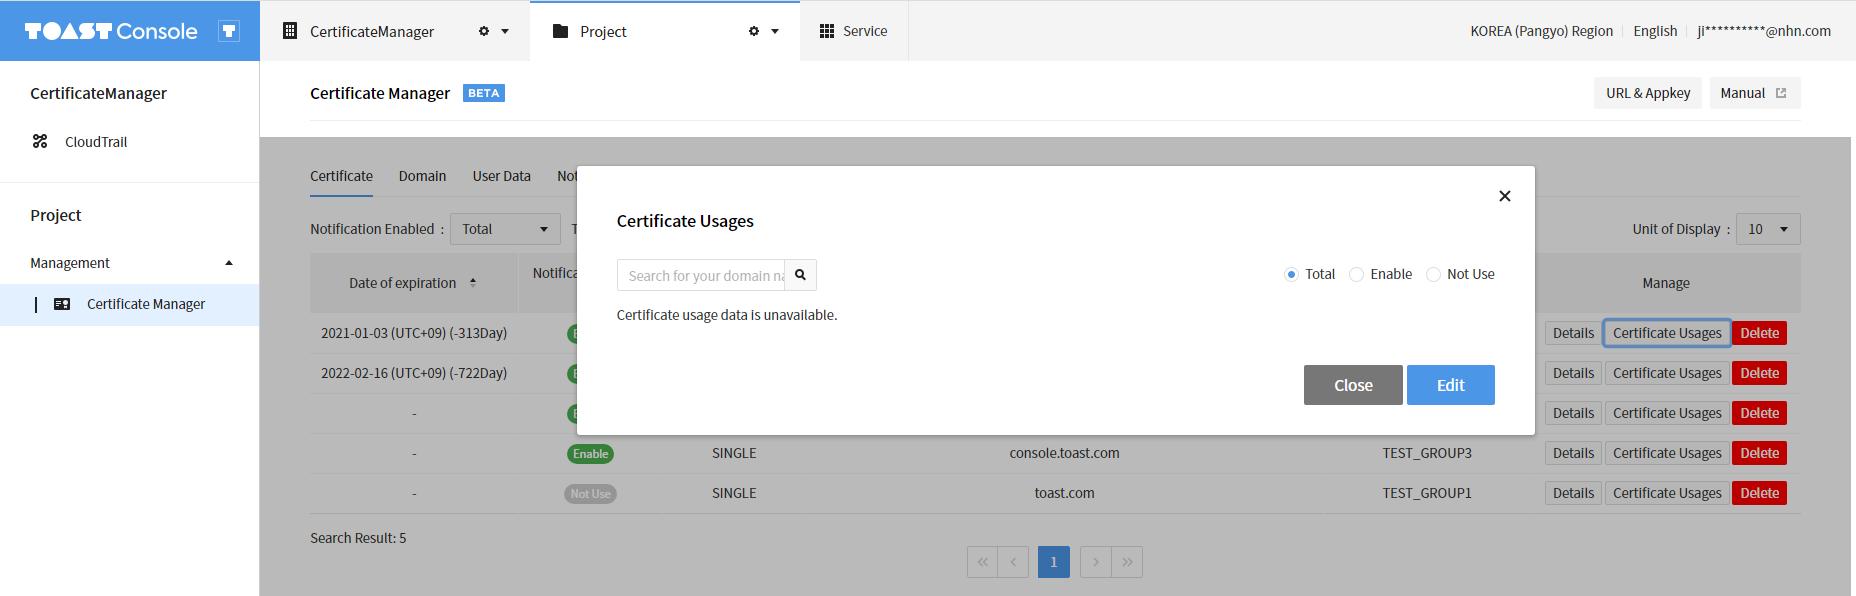 certificate-4.png